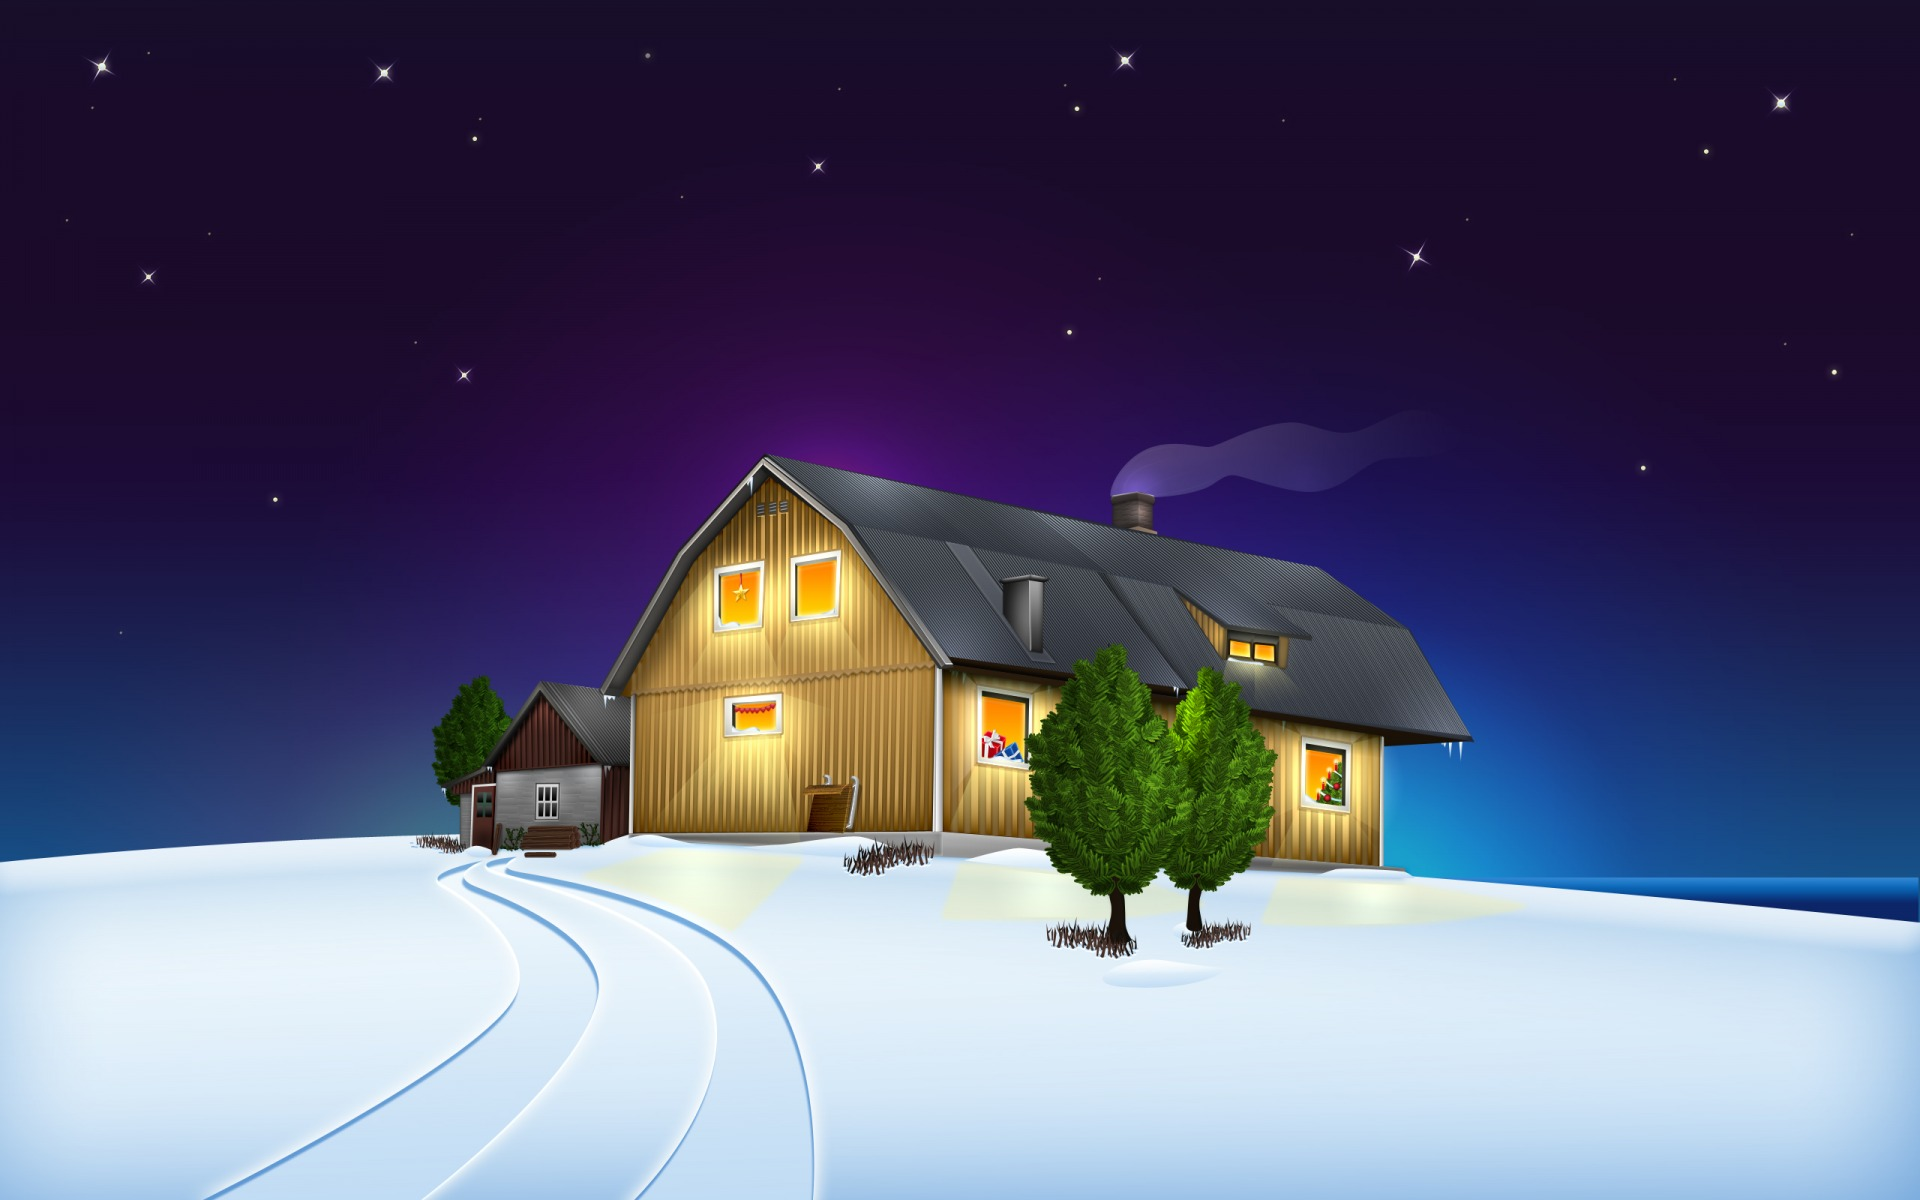 Christmas House Desktop Wallpapers WallpaperCowcom 1920x1200